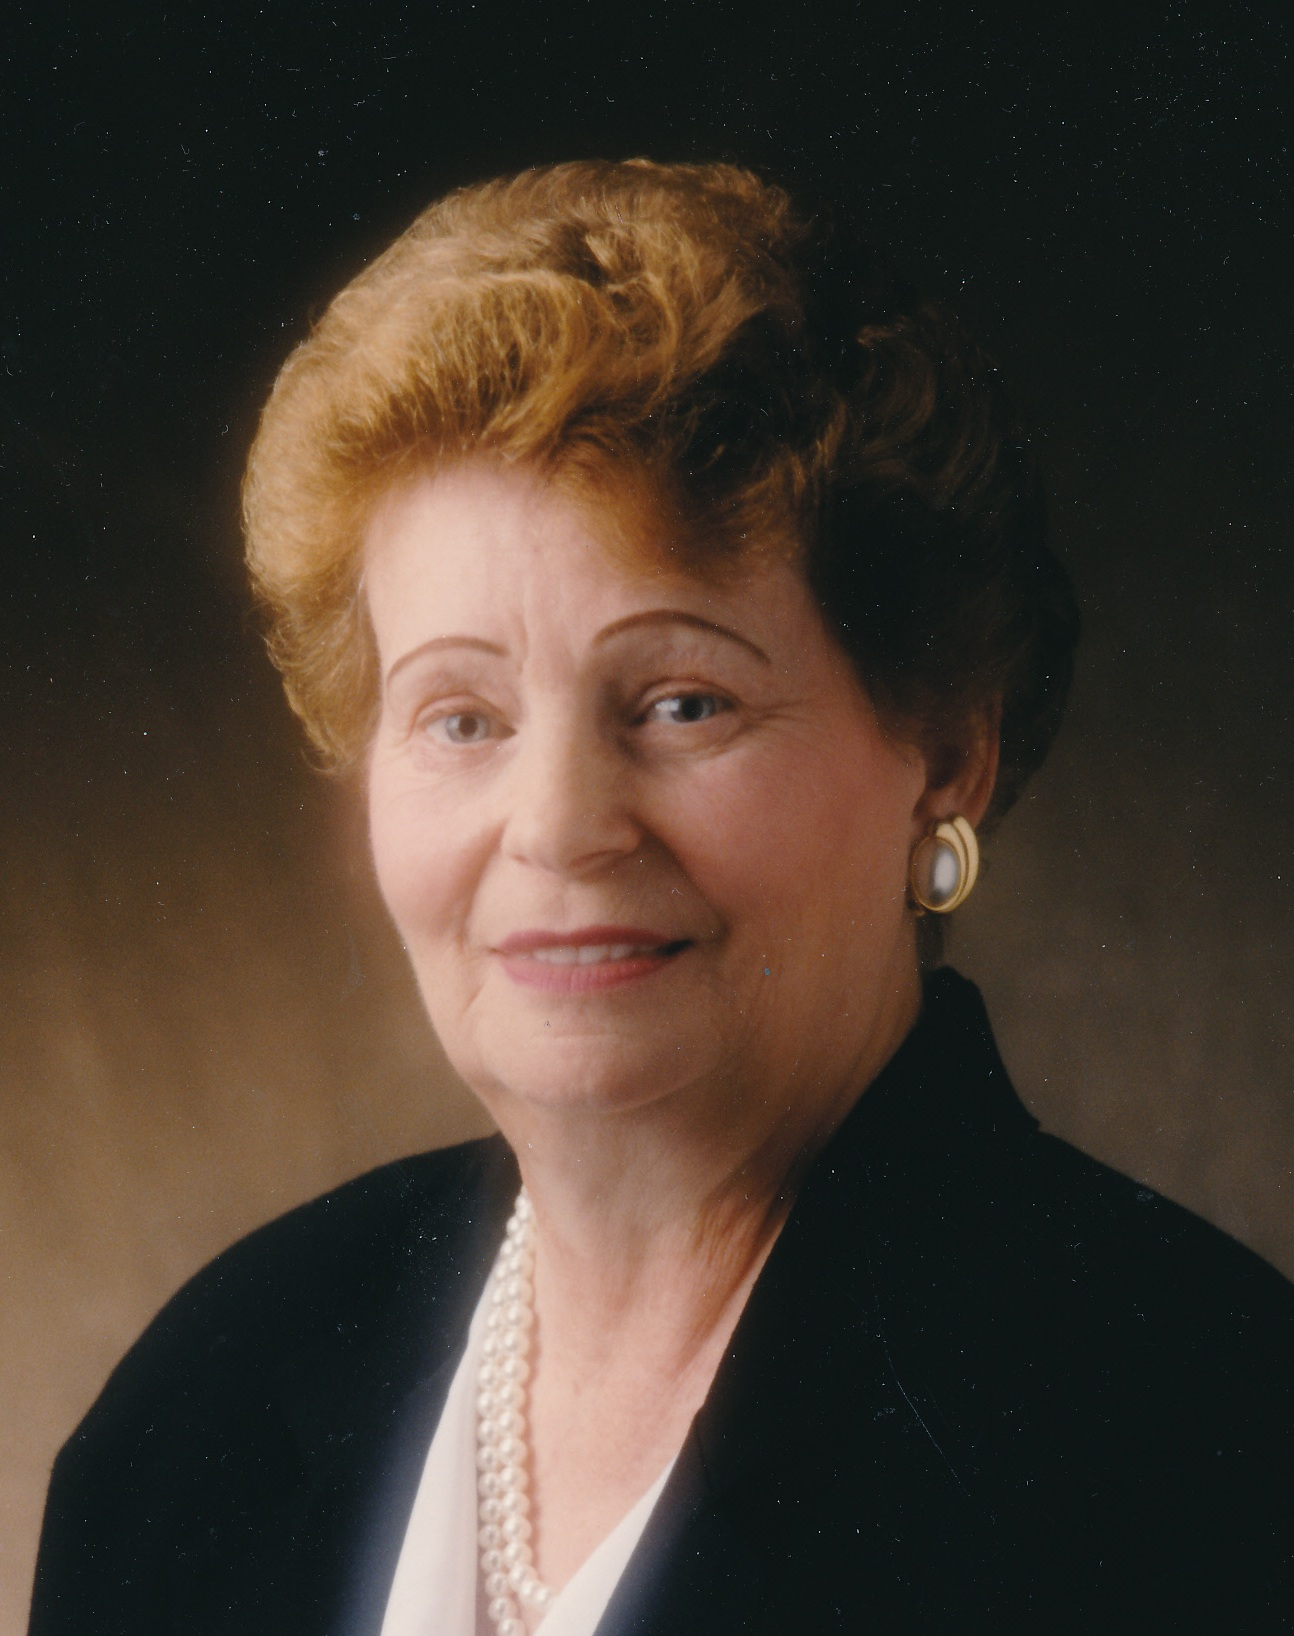 Jeanne-Mance Bourgault Pelletier